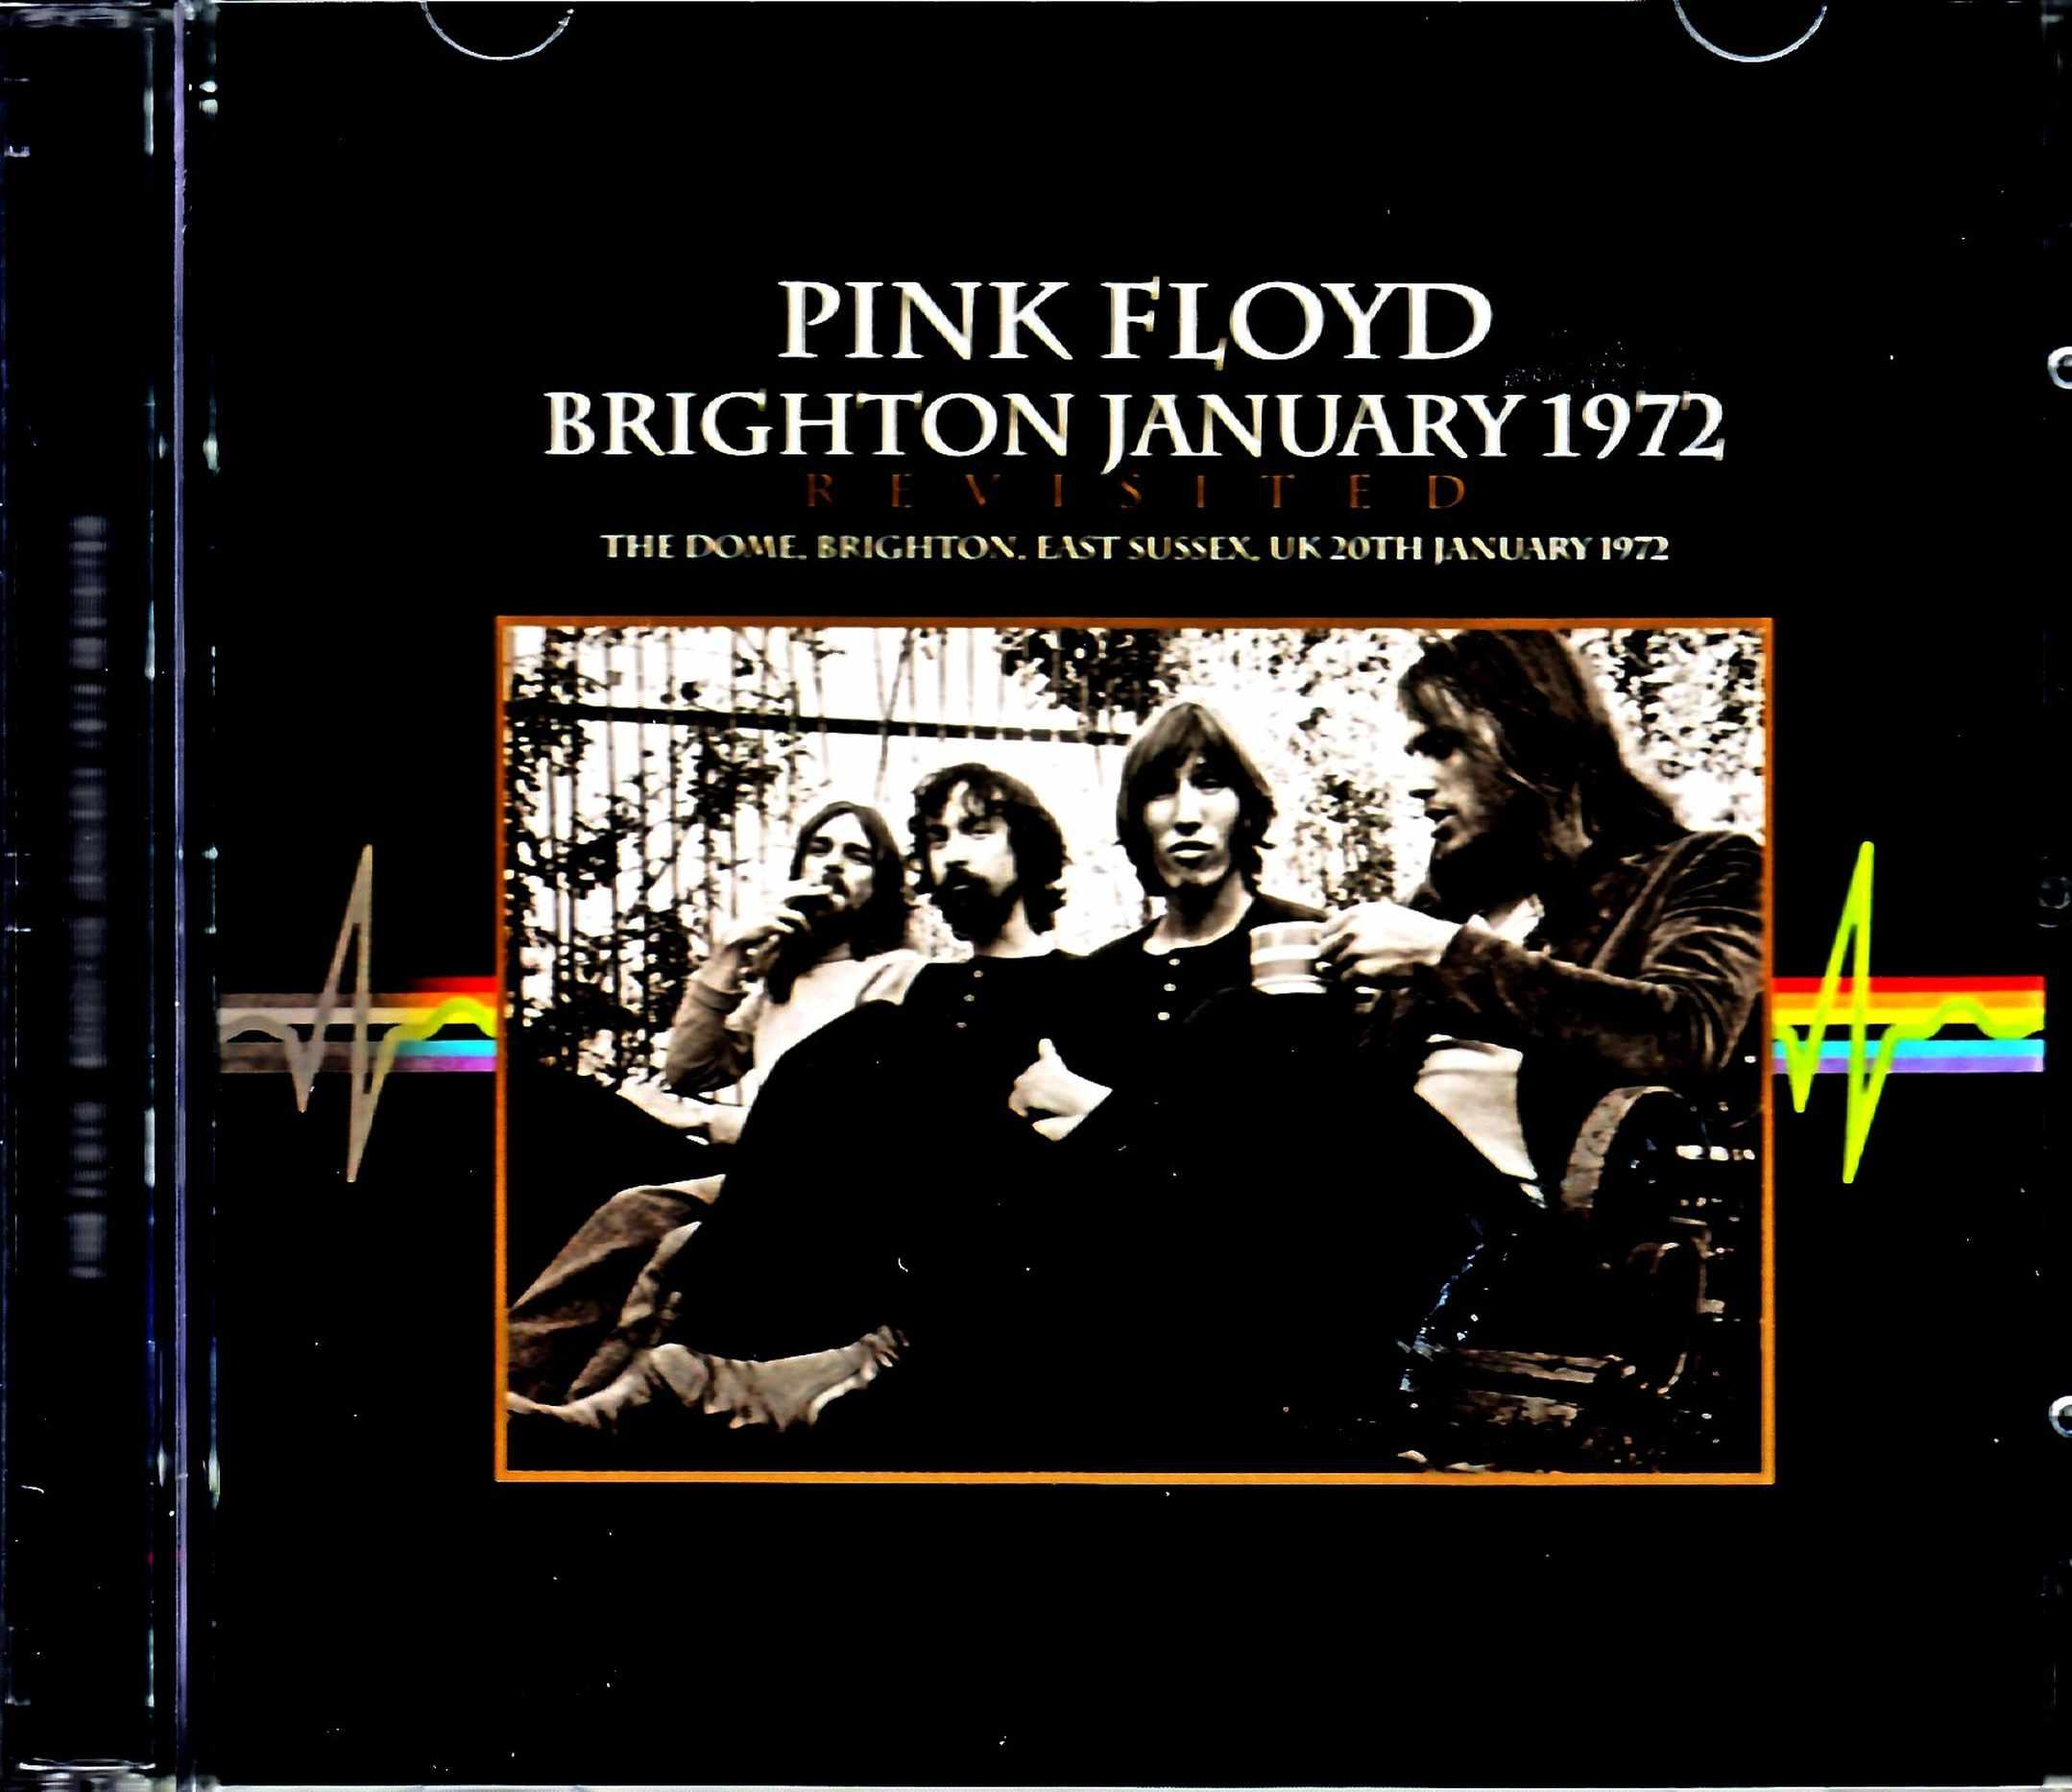 Pink Floyd ピンク・フロイド/England,UK 1972